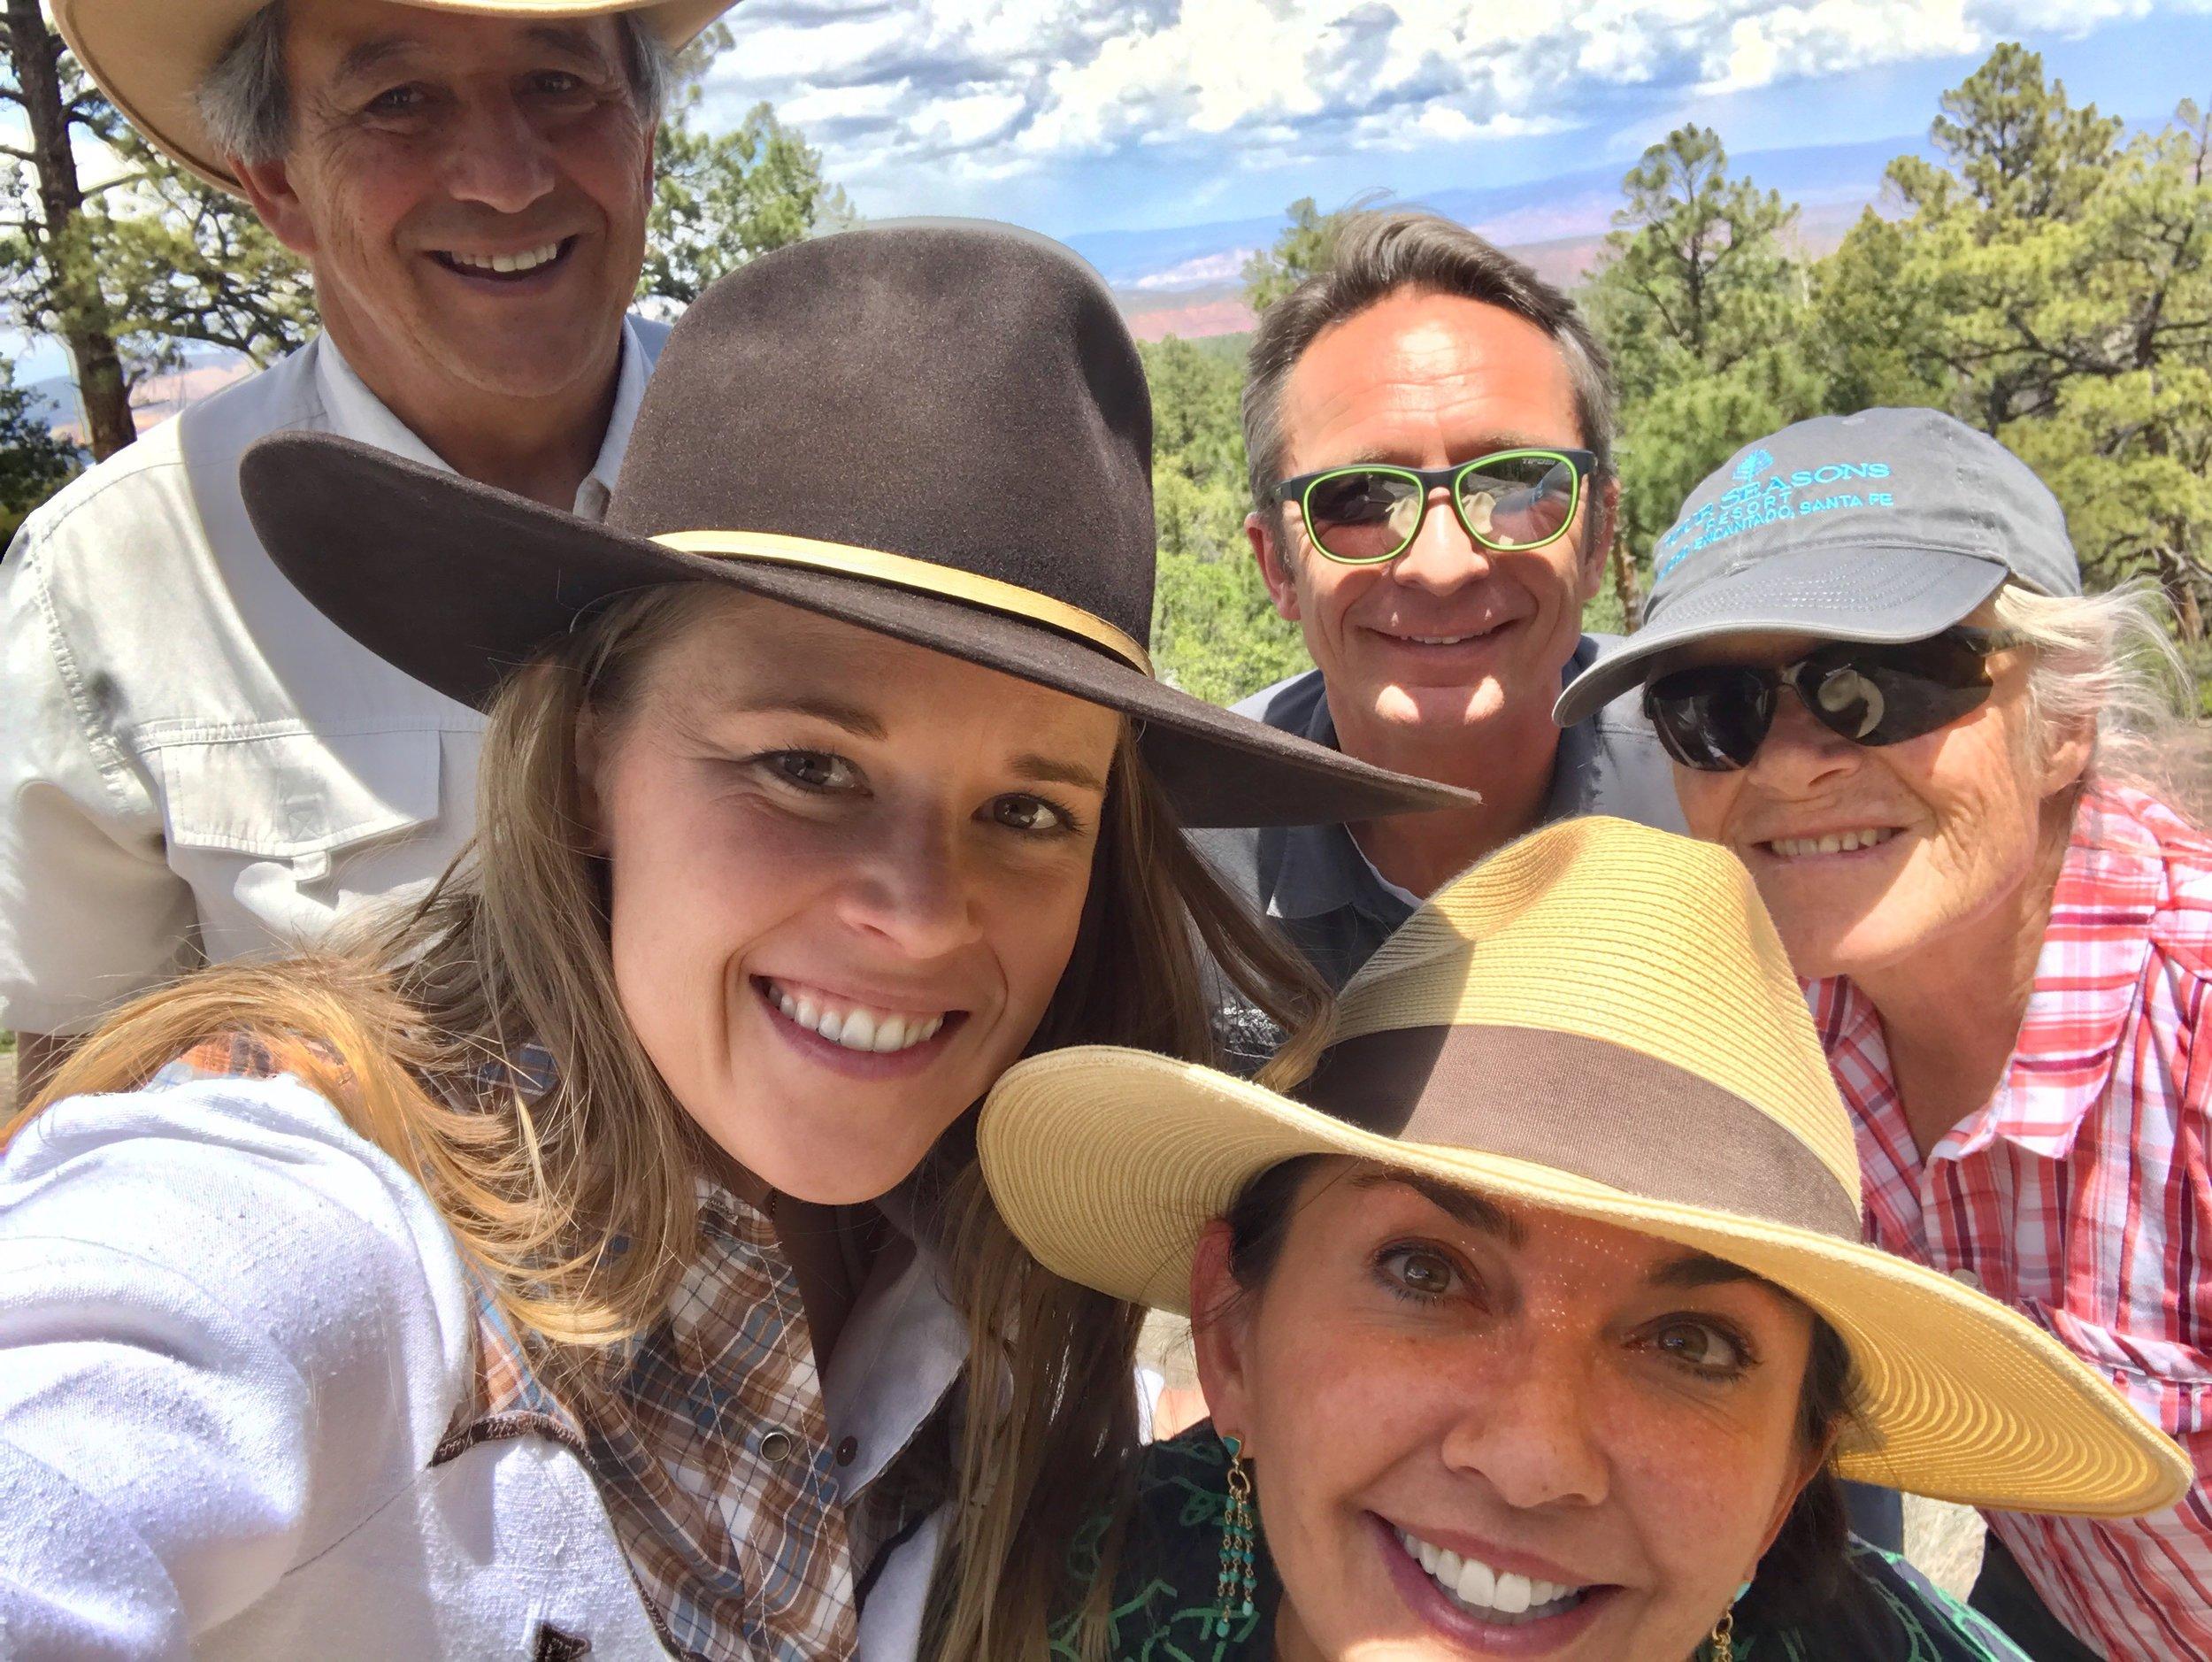 Friends from  The Four Seasons Resort Rancho Encantado Santa Fe  visiting Resolana Farms, 2019.